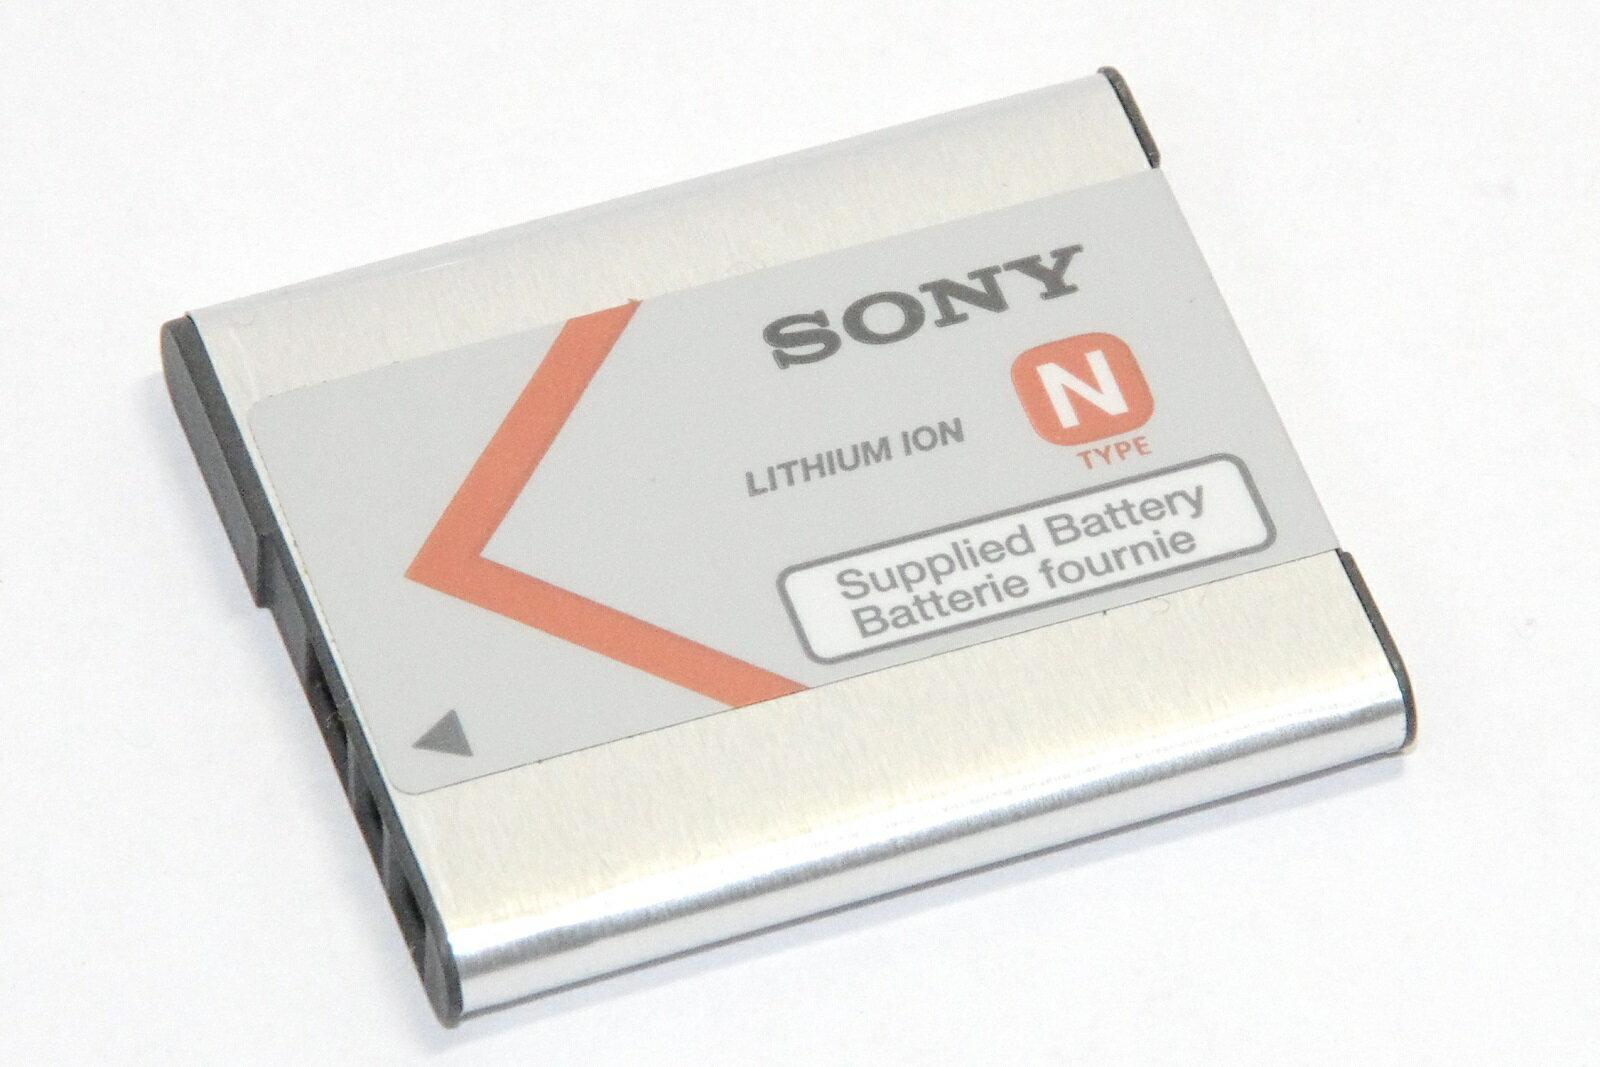 SONY ソニー NP-BN  英語表記版 リチャージャブルバッテリーパック純正同梱品 送料無料・あす楽対応【メール便】  DSC-WX70など充電池